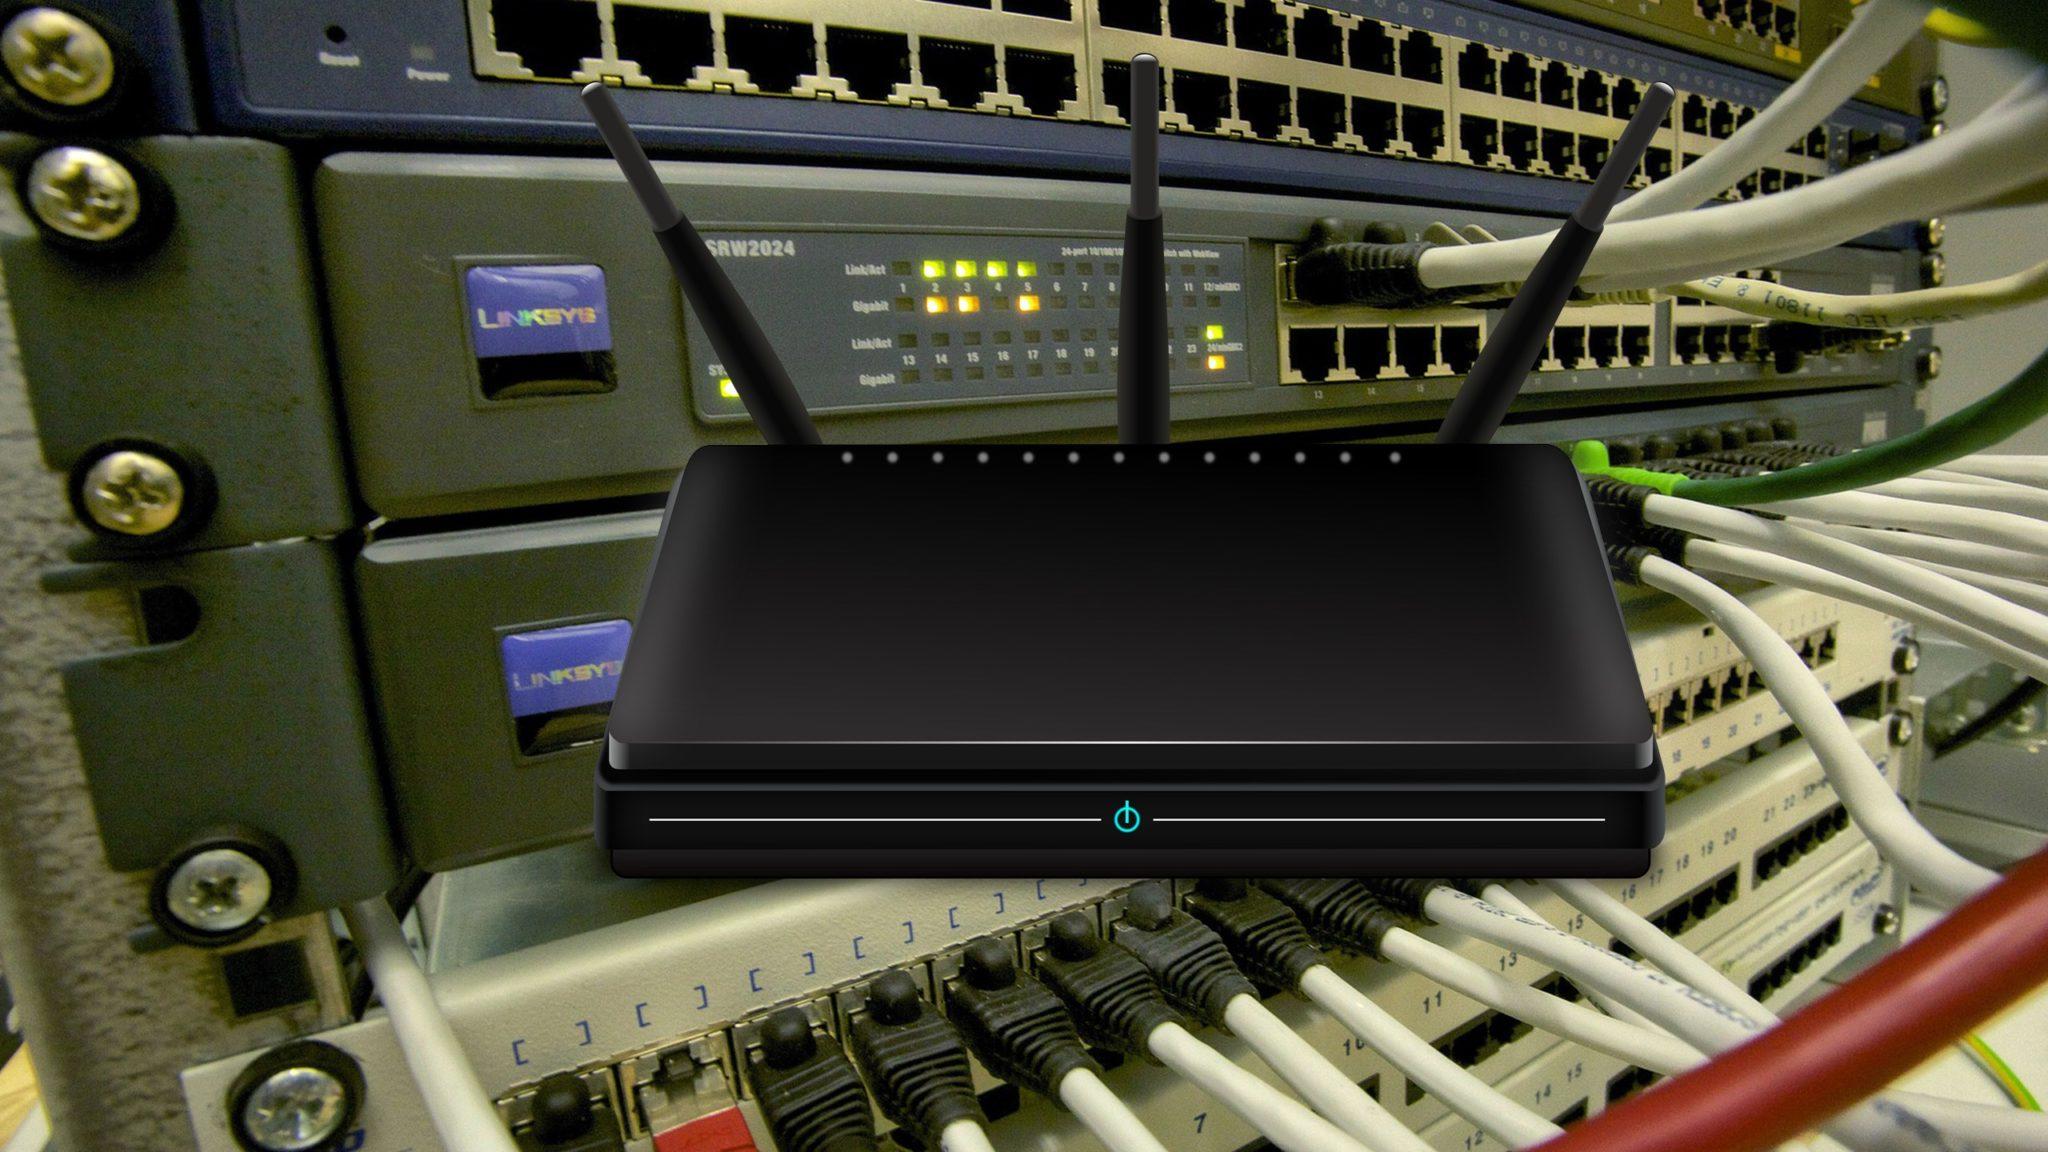 Router, sprzęt, sieci